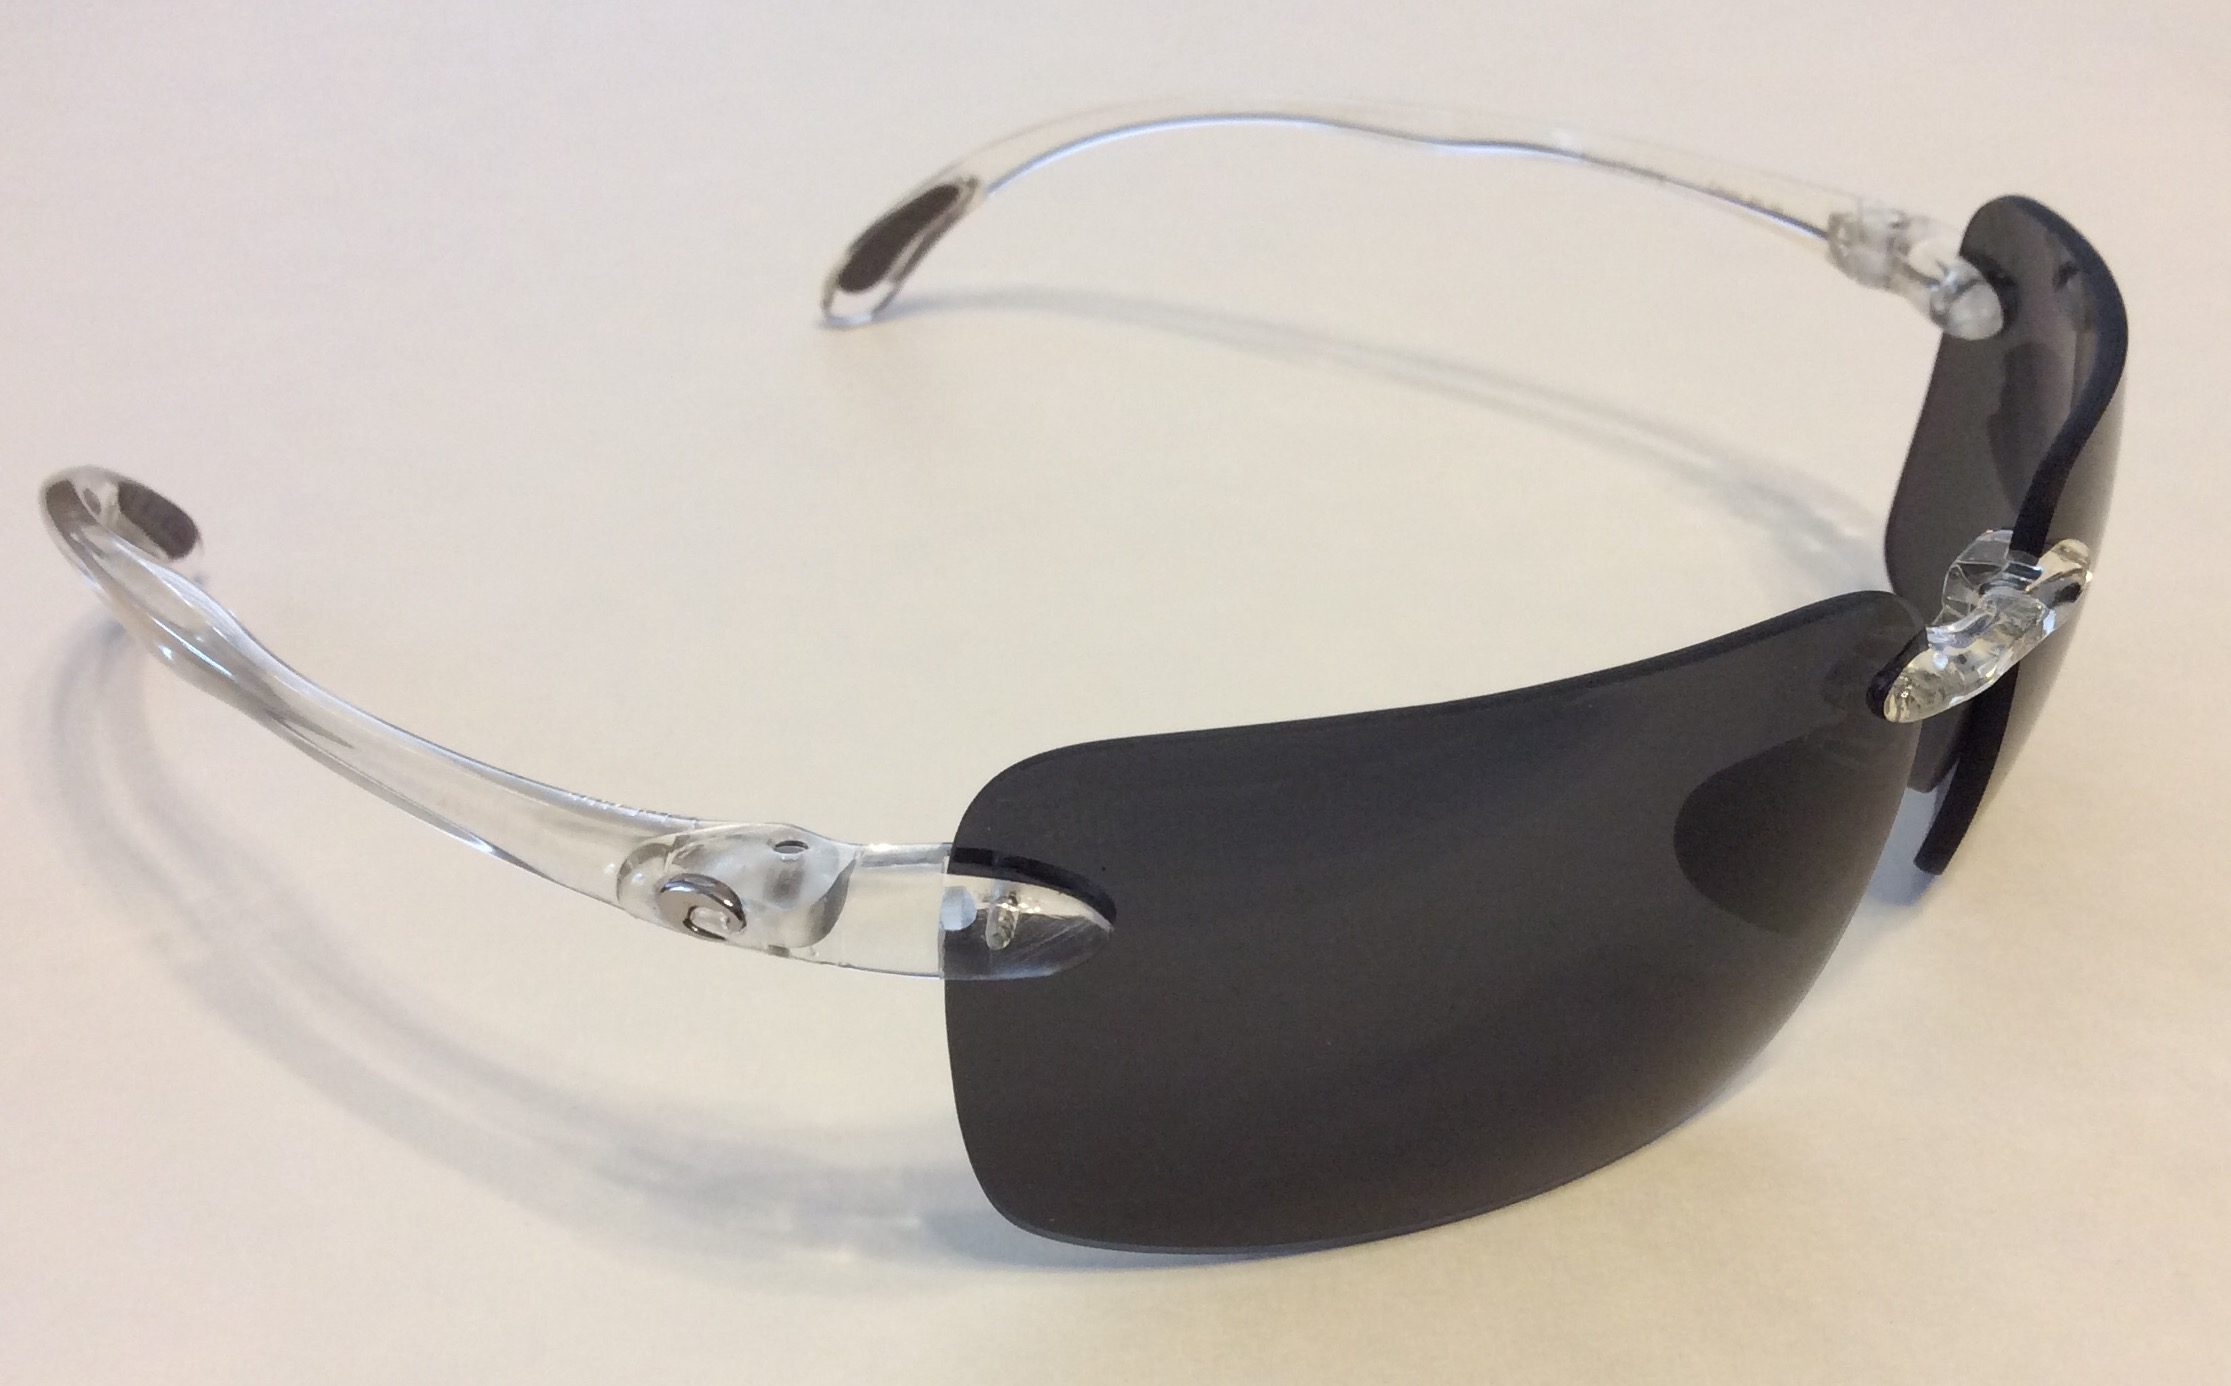 90050bb20a118 Costa Del Mar Cayan Sunglasses – Crystal Clear Frame – Polarized ...